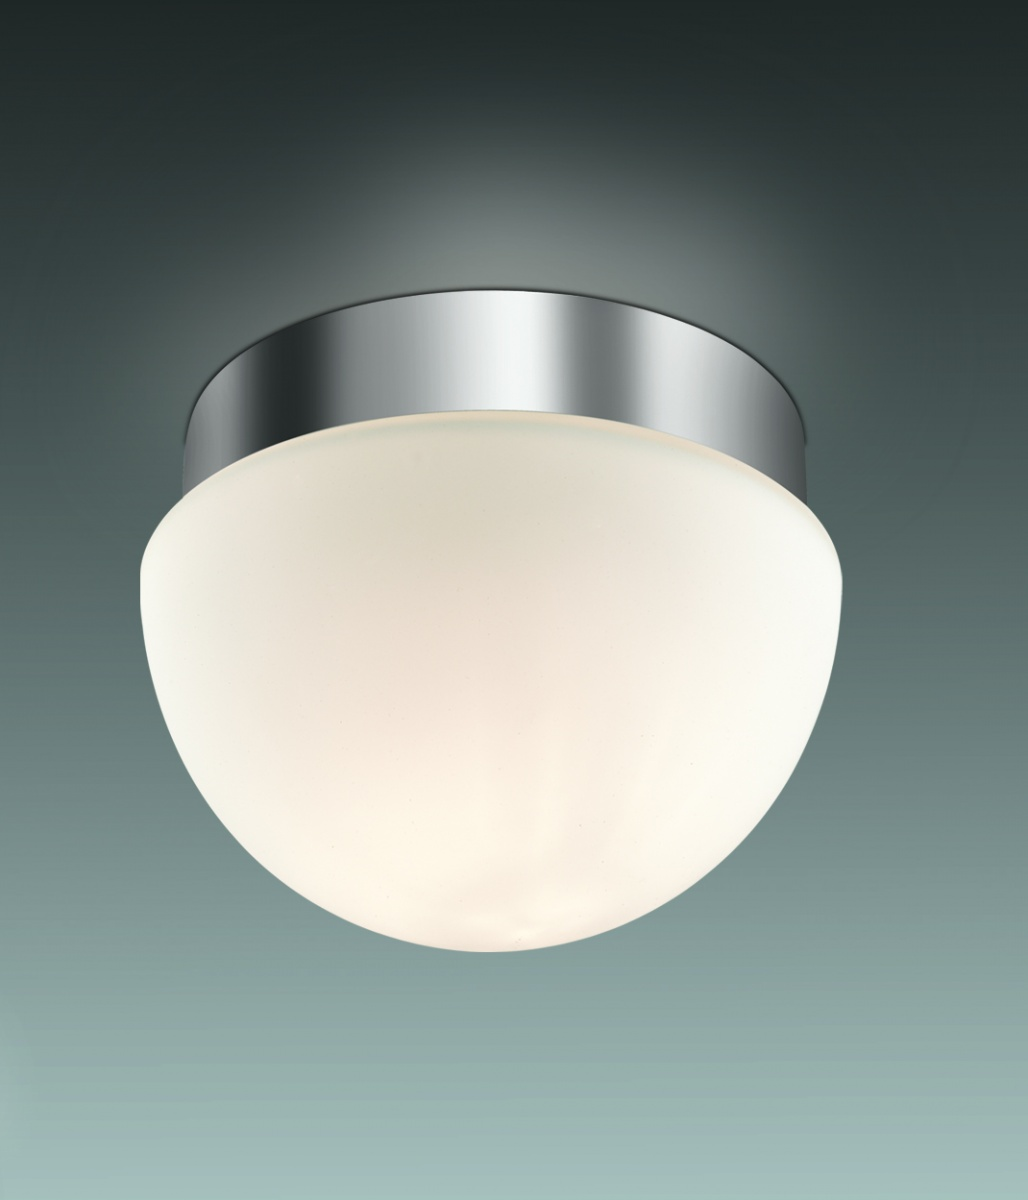 Odeon Light 2443/1A Потолочный светильник MINKAR 2х40W G9 IP44 хром